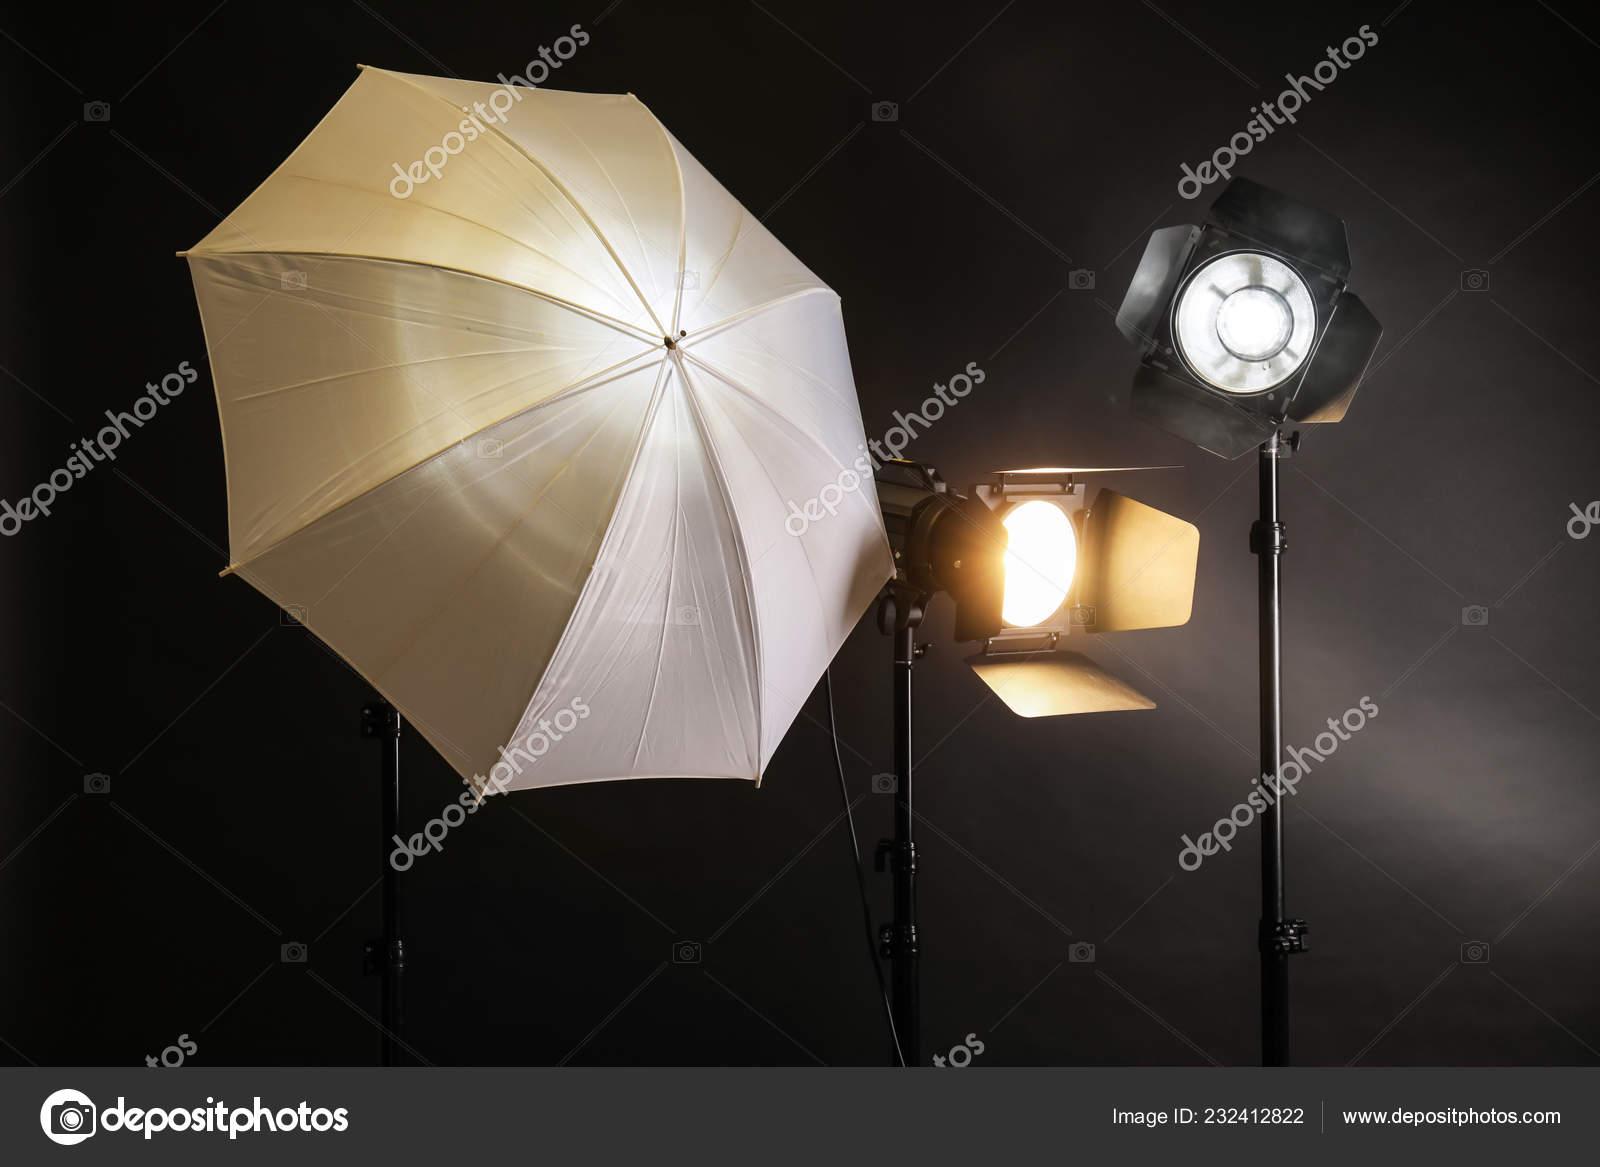 Professional Lighting Equipment Dark Background Stock Photo C Serezniy 232412822